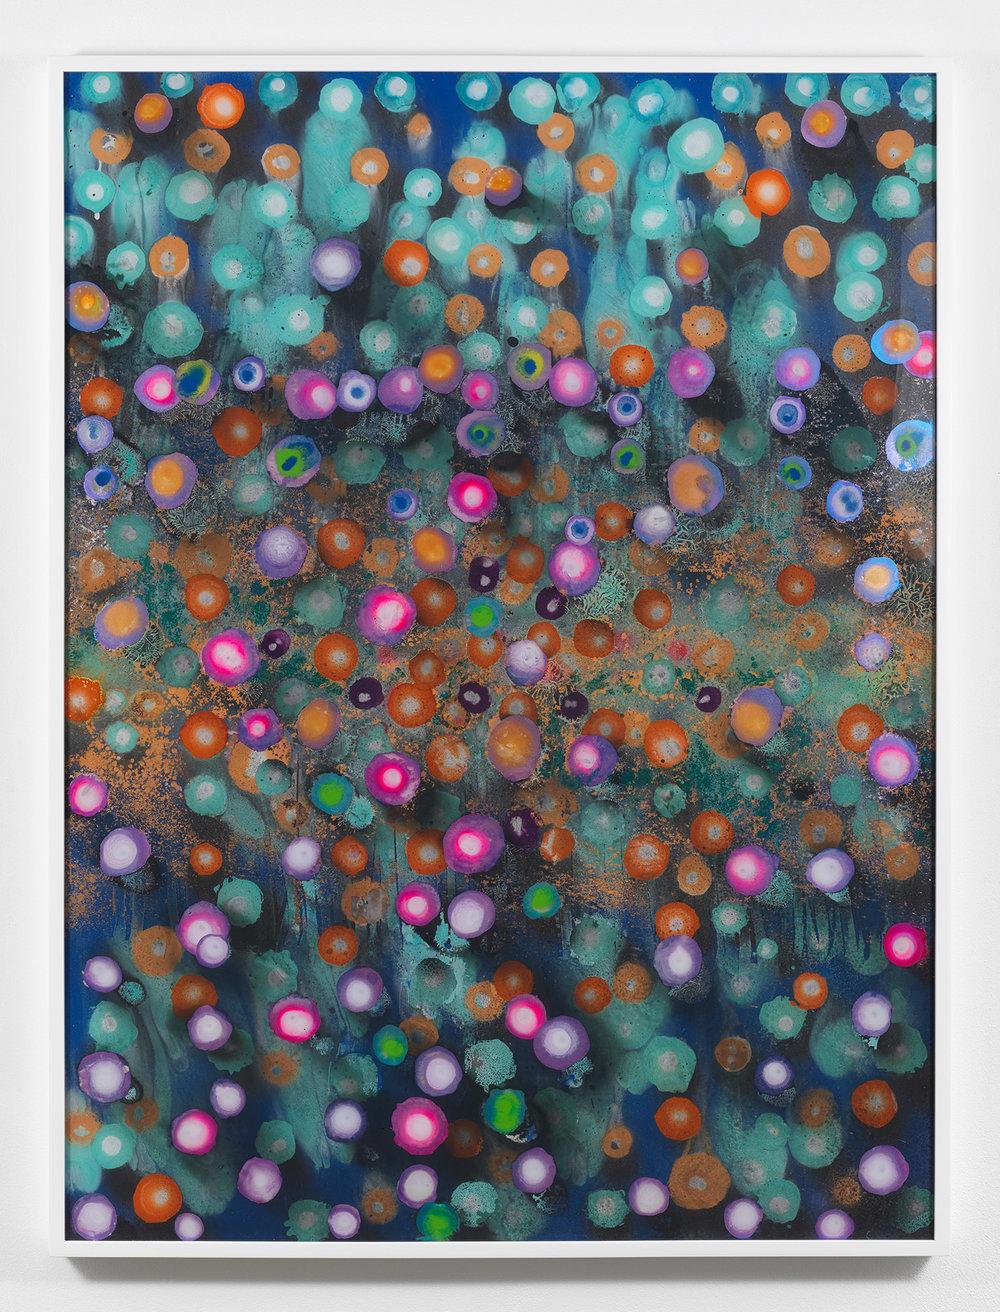 Giacinto Occhionero  The Last Purple , 2017 Spray paint on plexiglass 40 x 30 inches (101.6 x 76.2 cm)